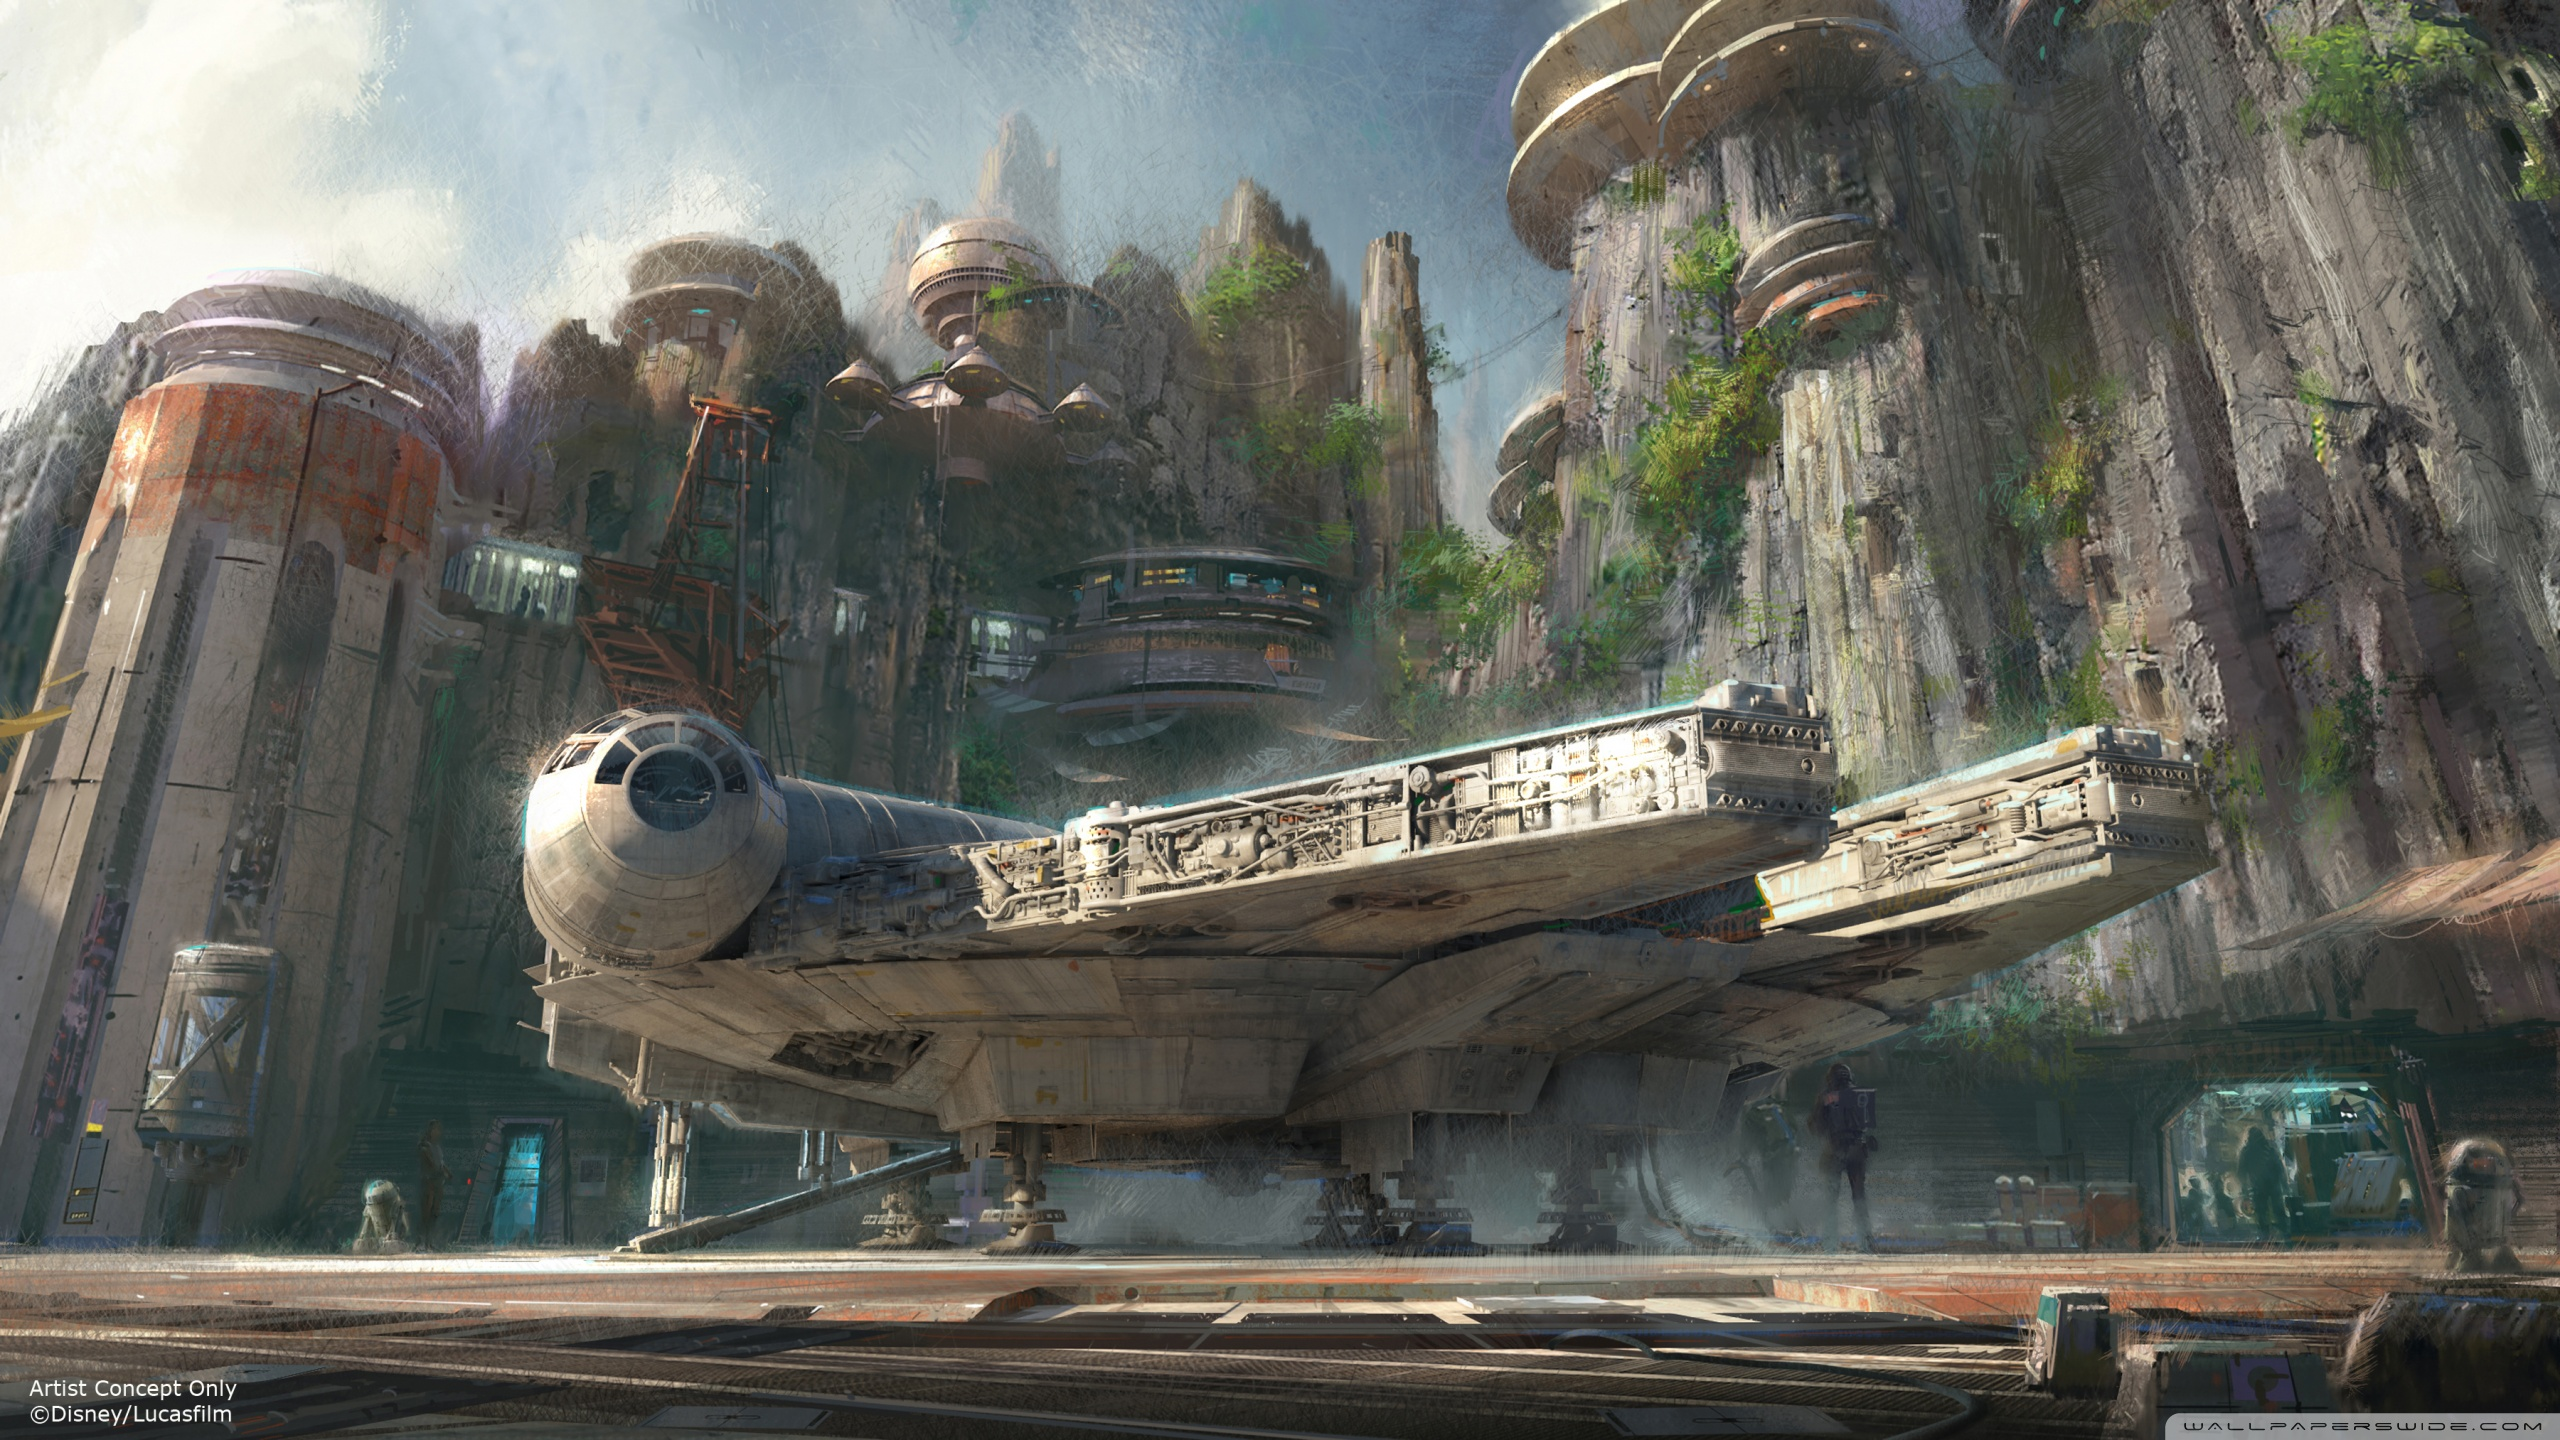 millennium_falcon_docked-wallpaper-2560x1440